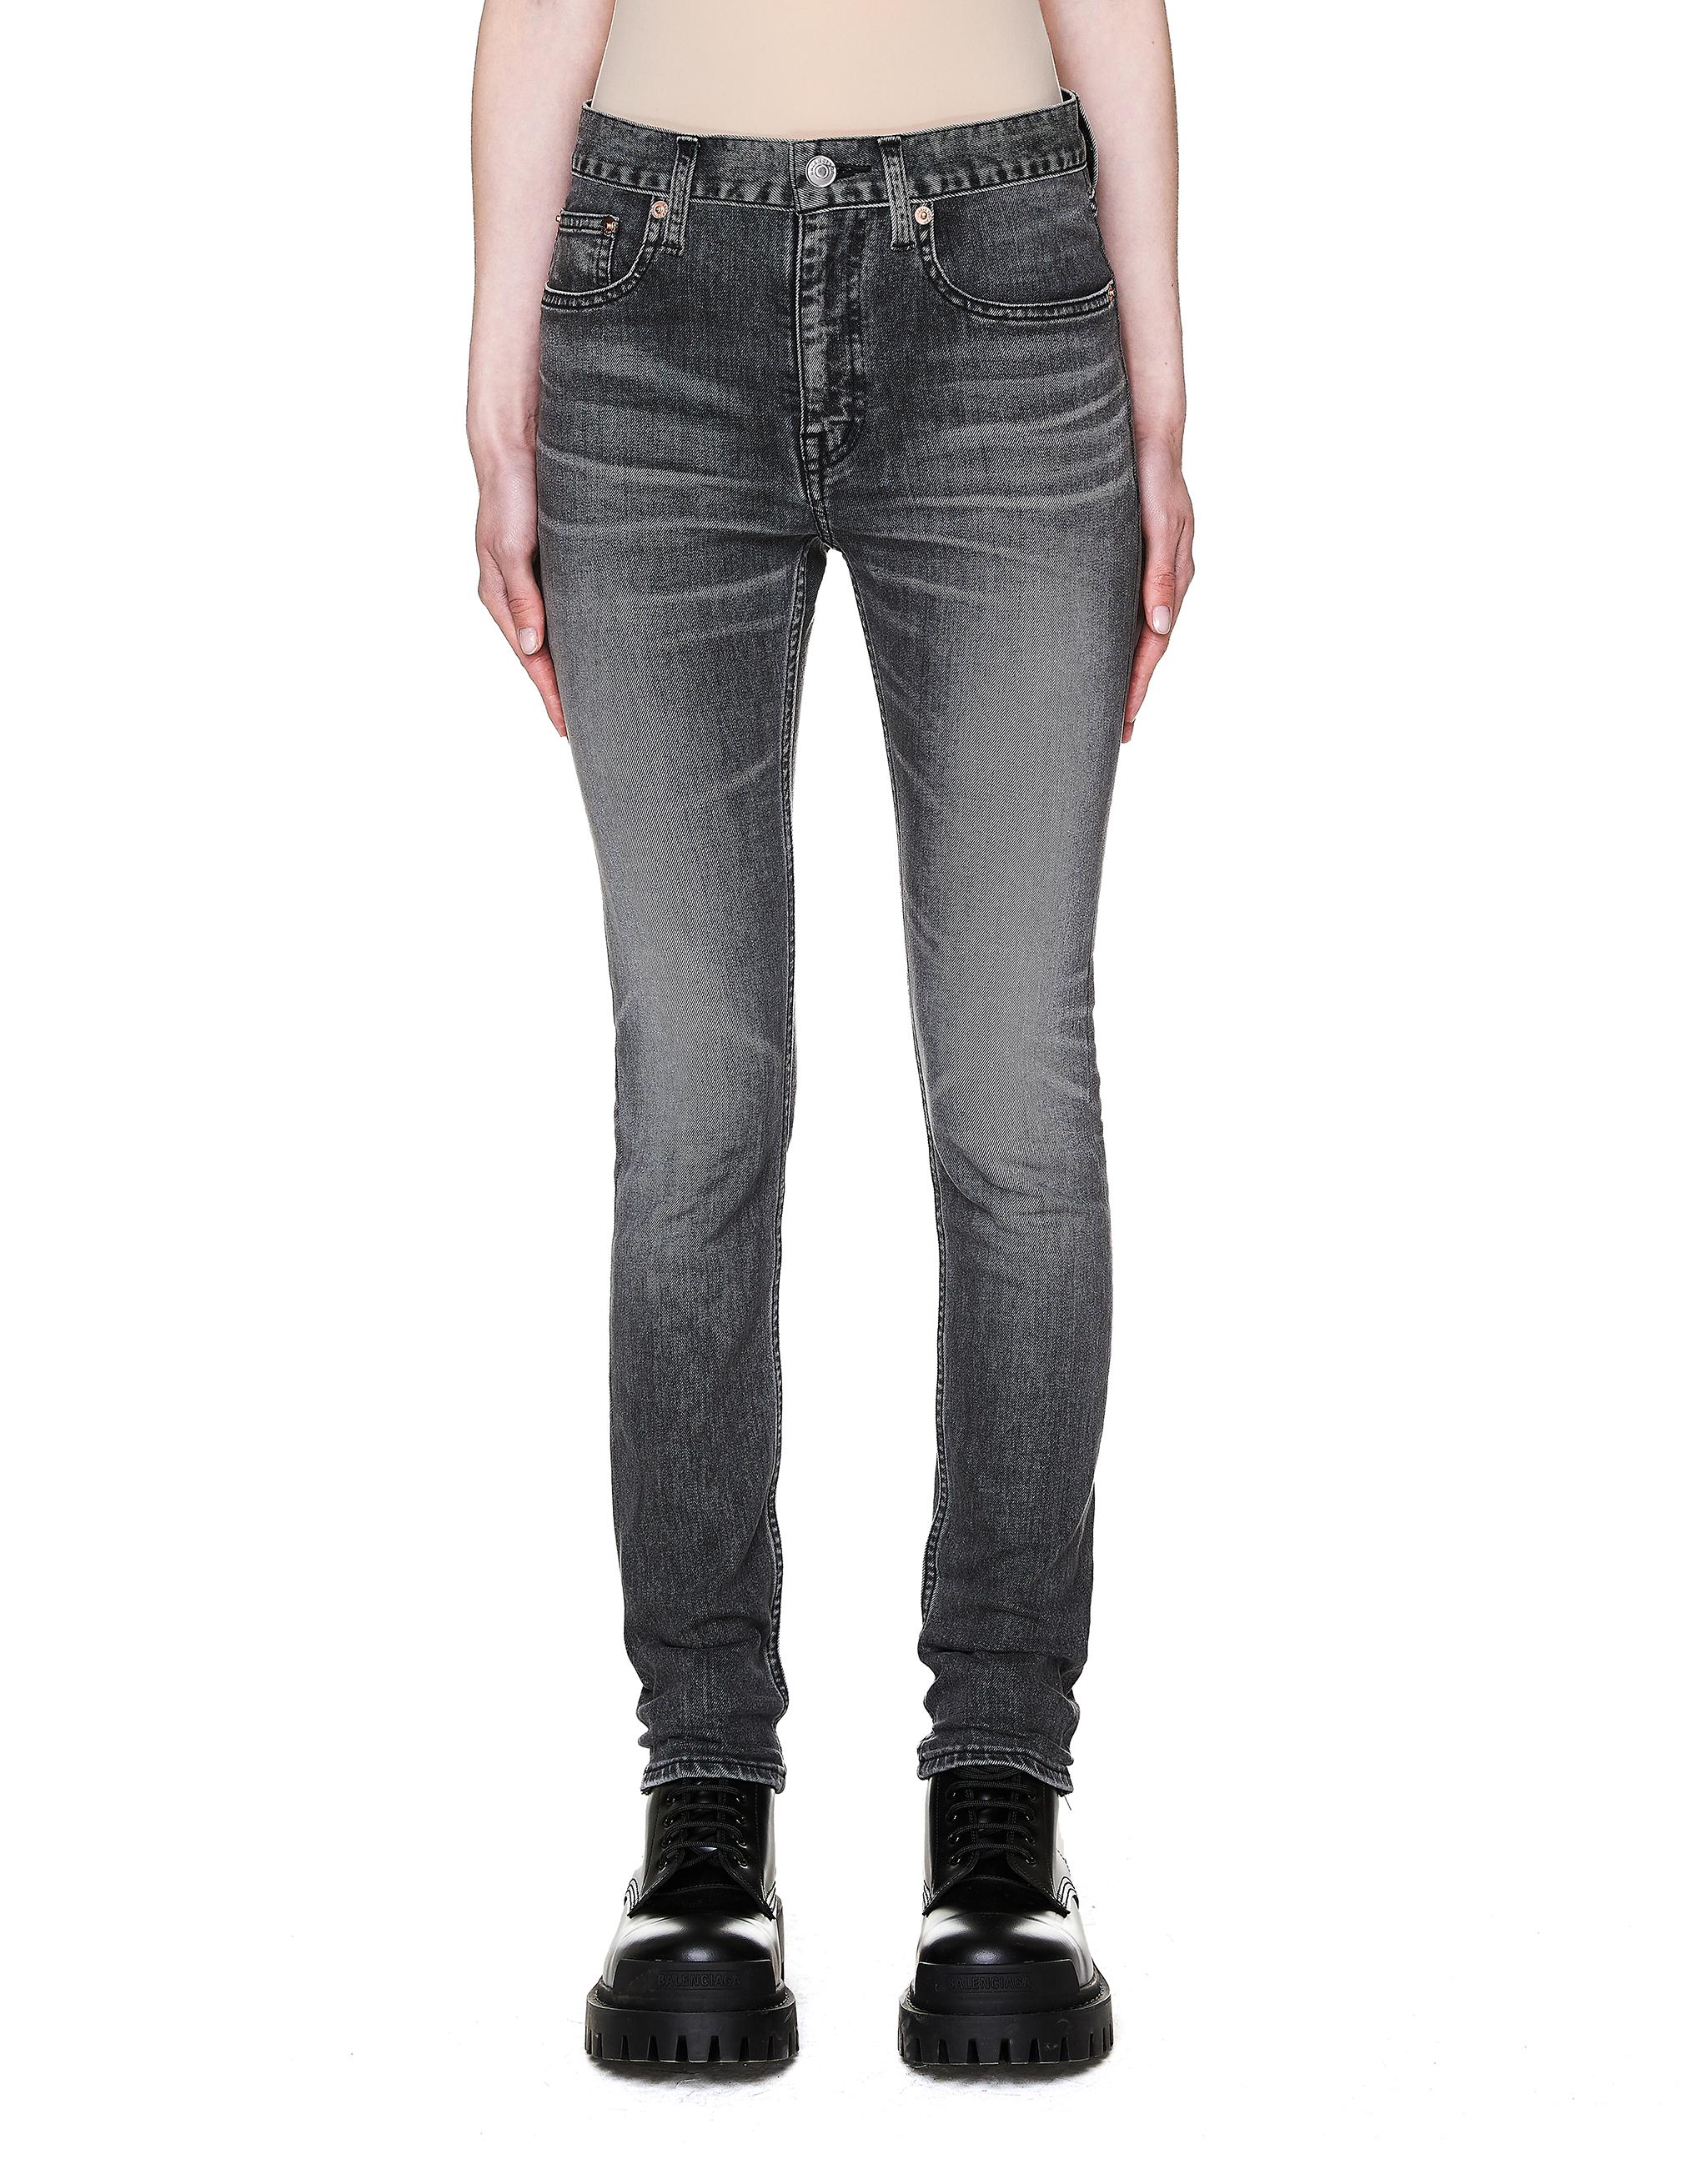 Balenciaga Grey Skinny Jeans